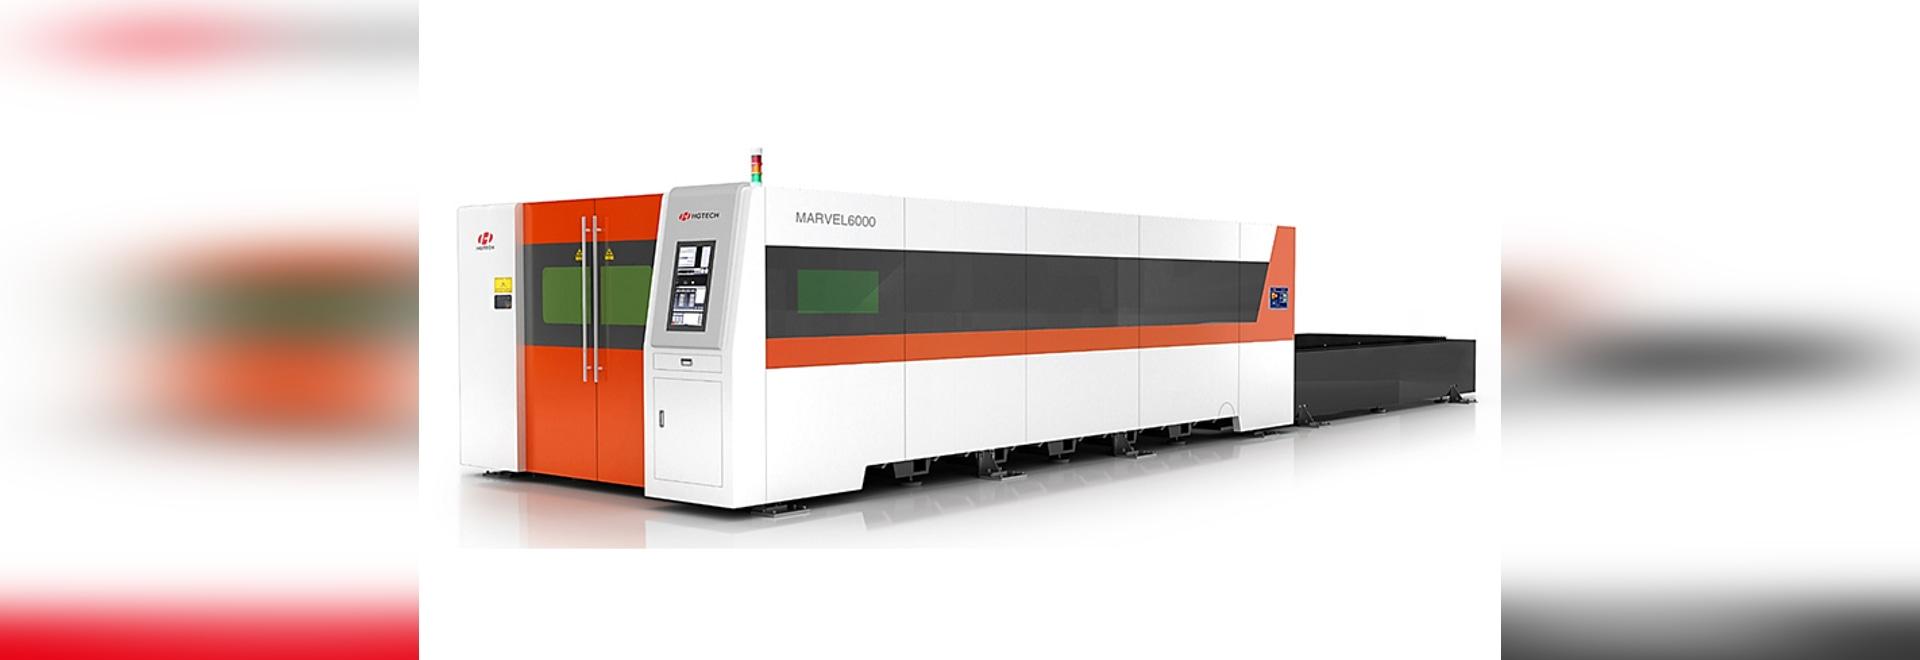 MARVEL 6000 series fiber laser cutting machine